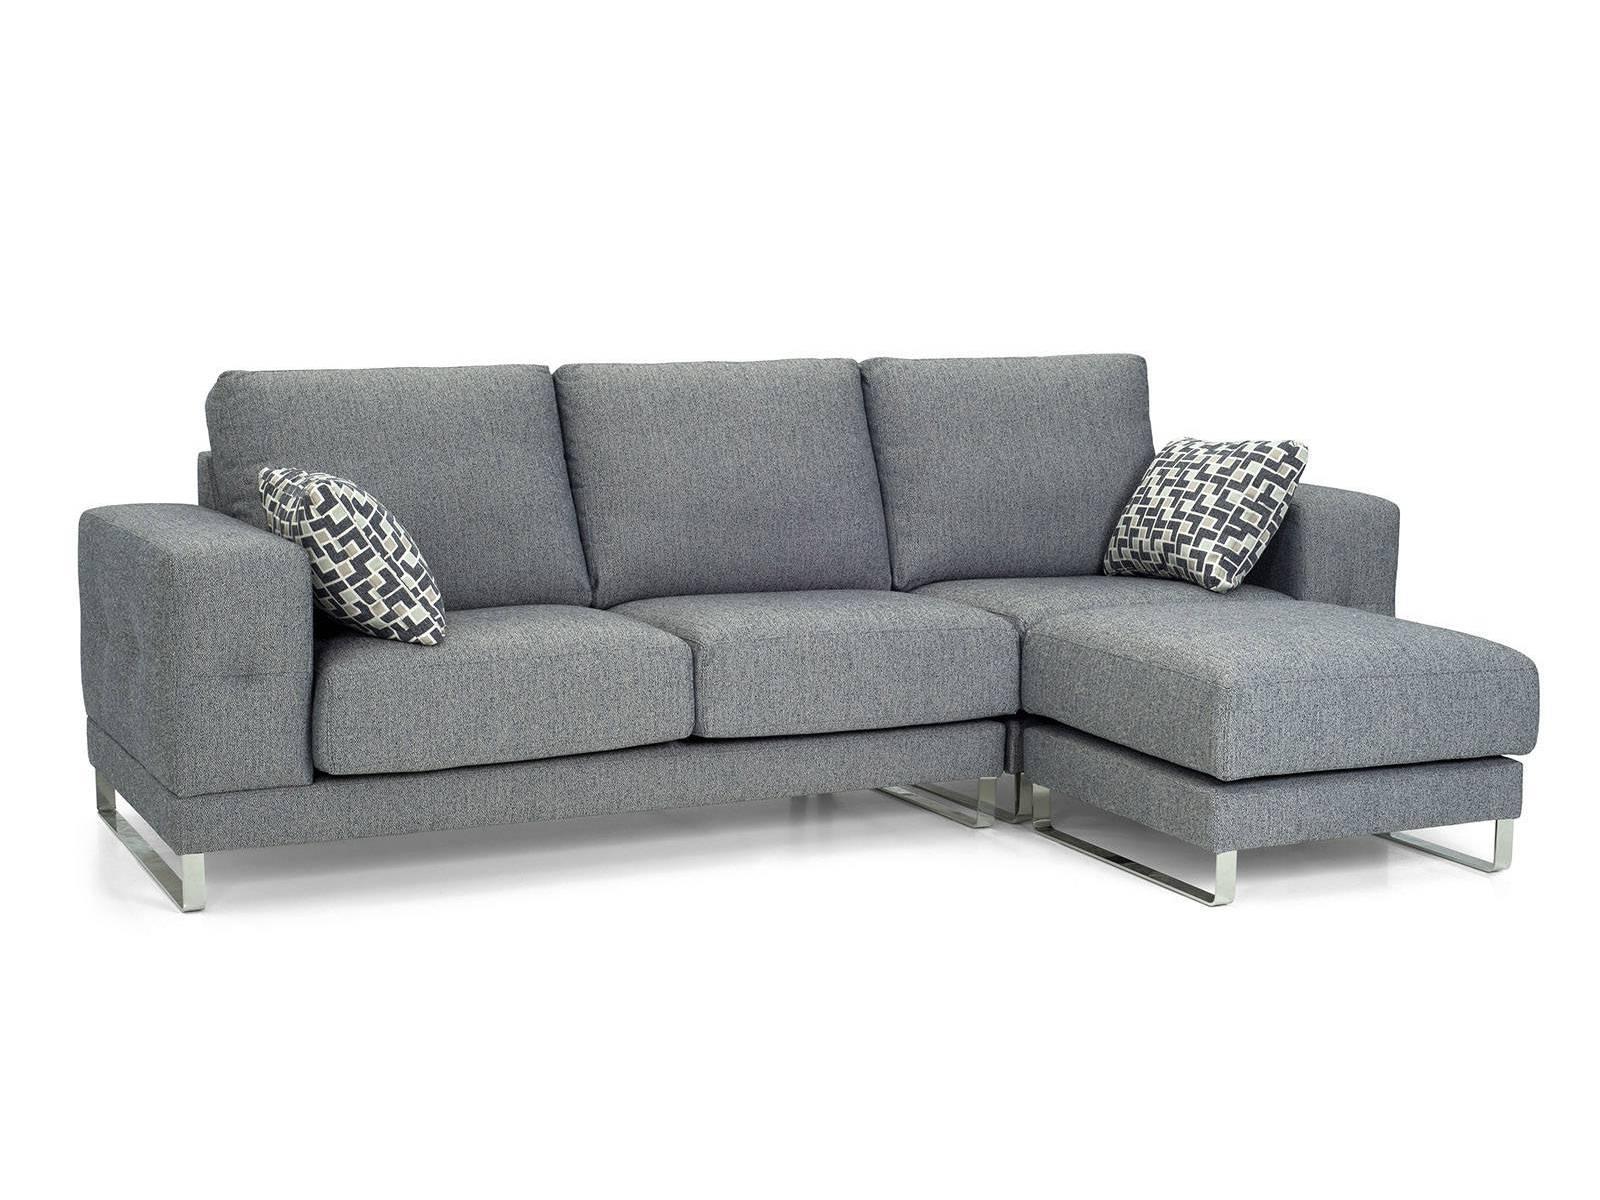 Stock sofas Carretera toledo Whdr sofà Chaise Longue Modelo Chic Izquierdo